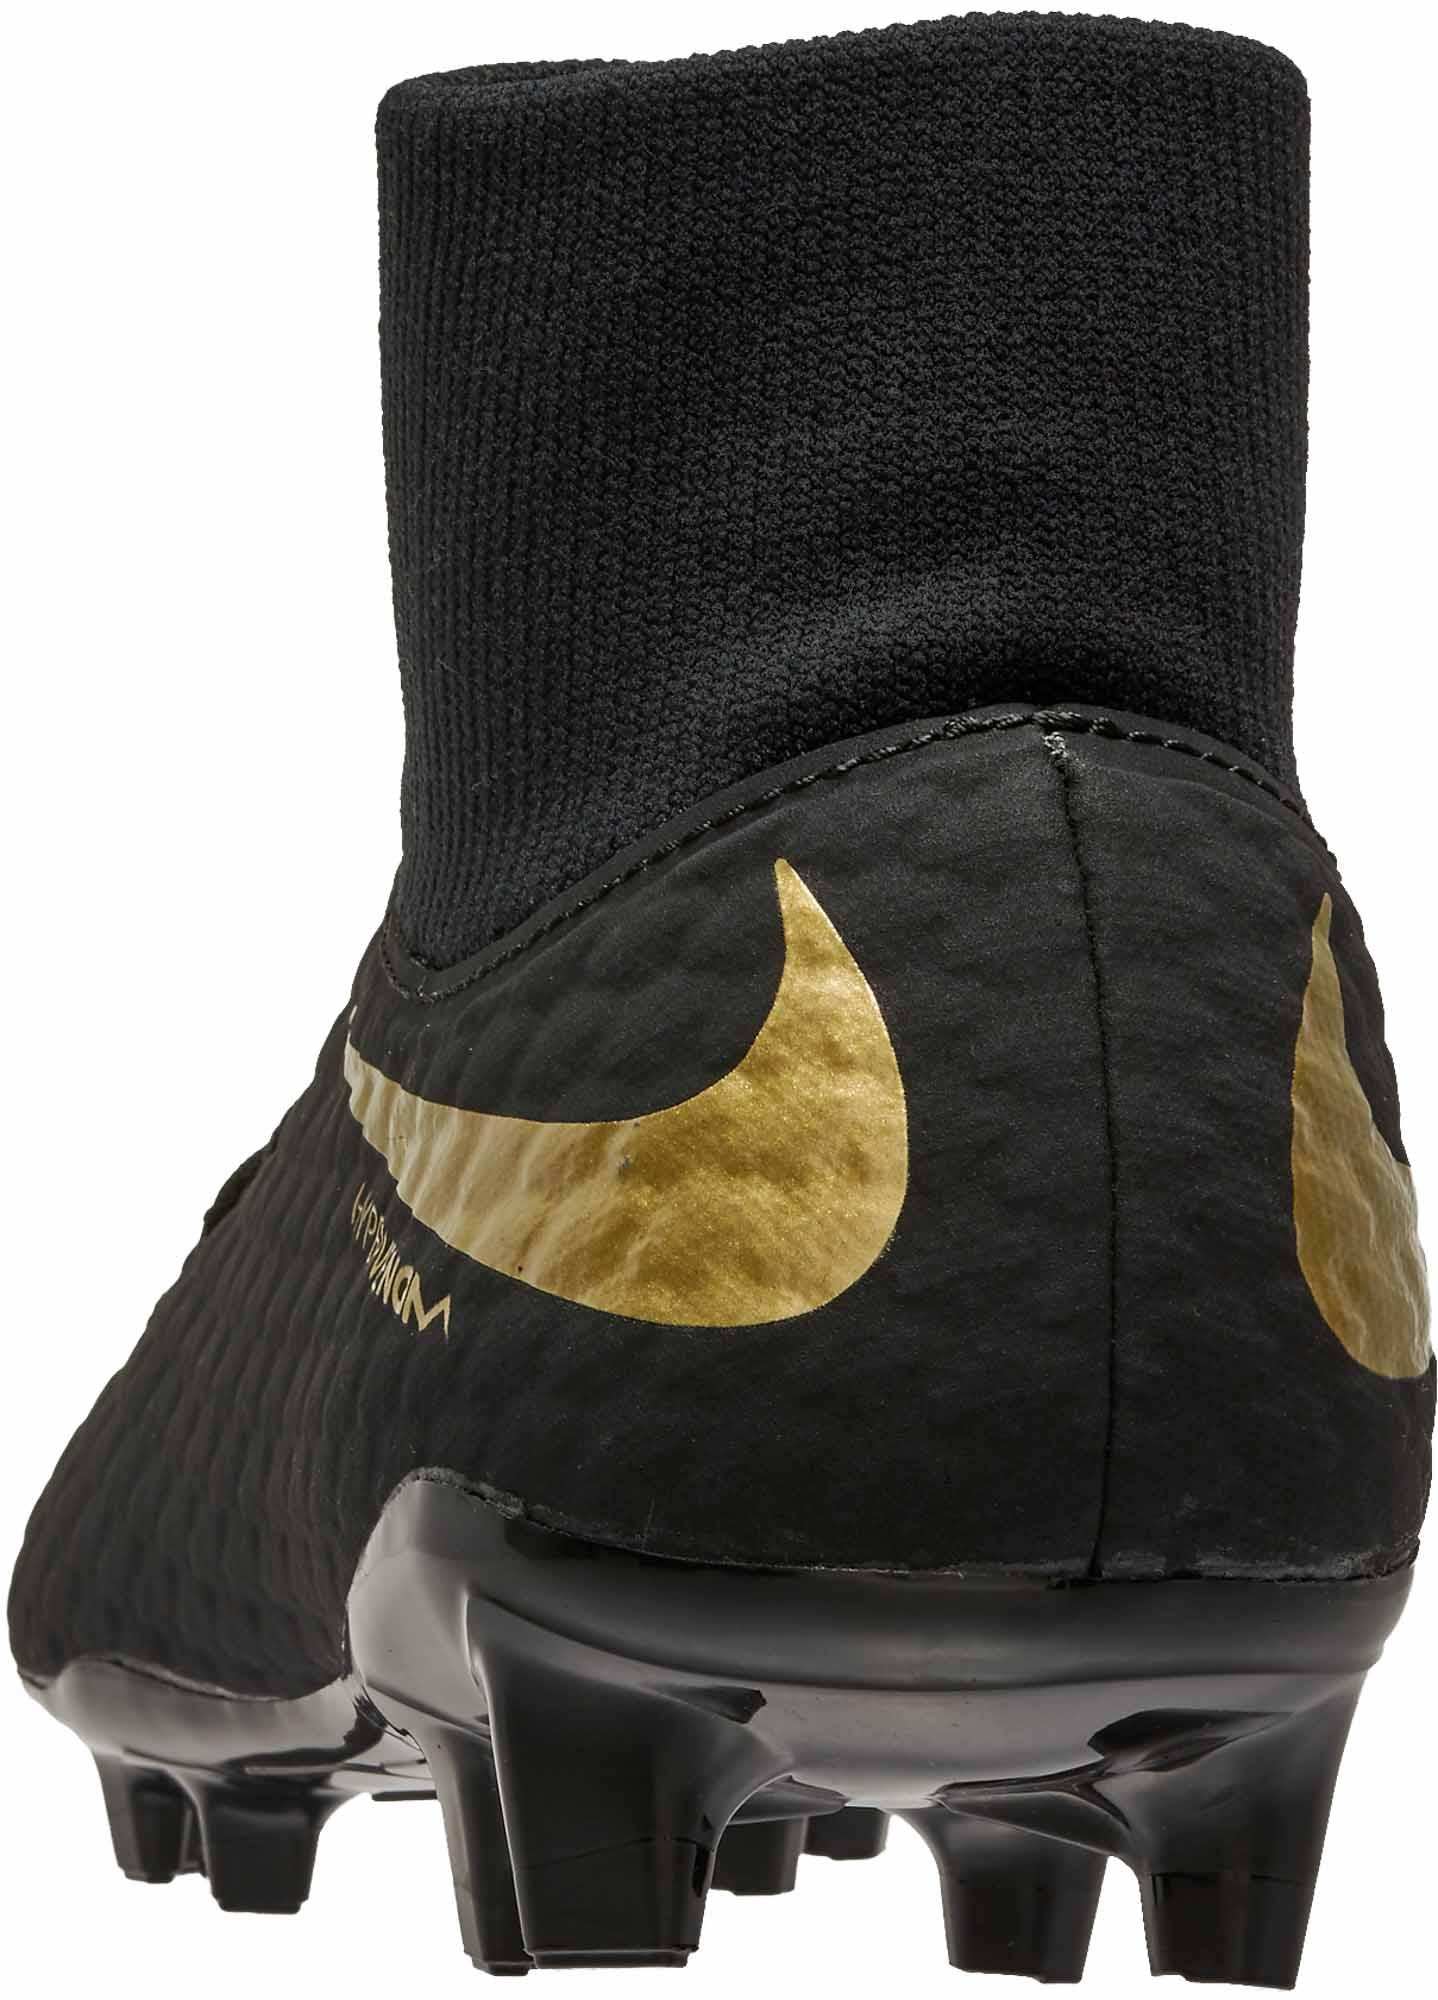 buy popular e5b05 81ba5 Nike Hypervenom Phantom III Academy DF FG – Black Metallic Vivid Gold